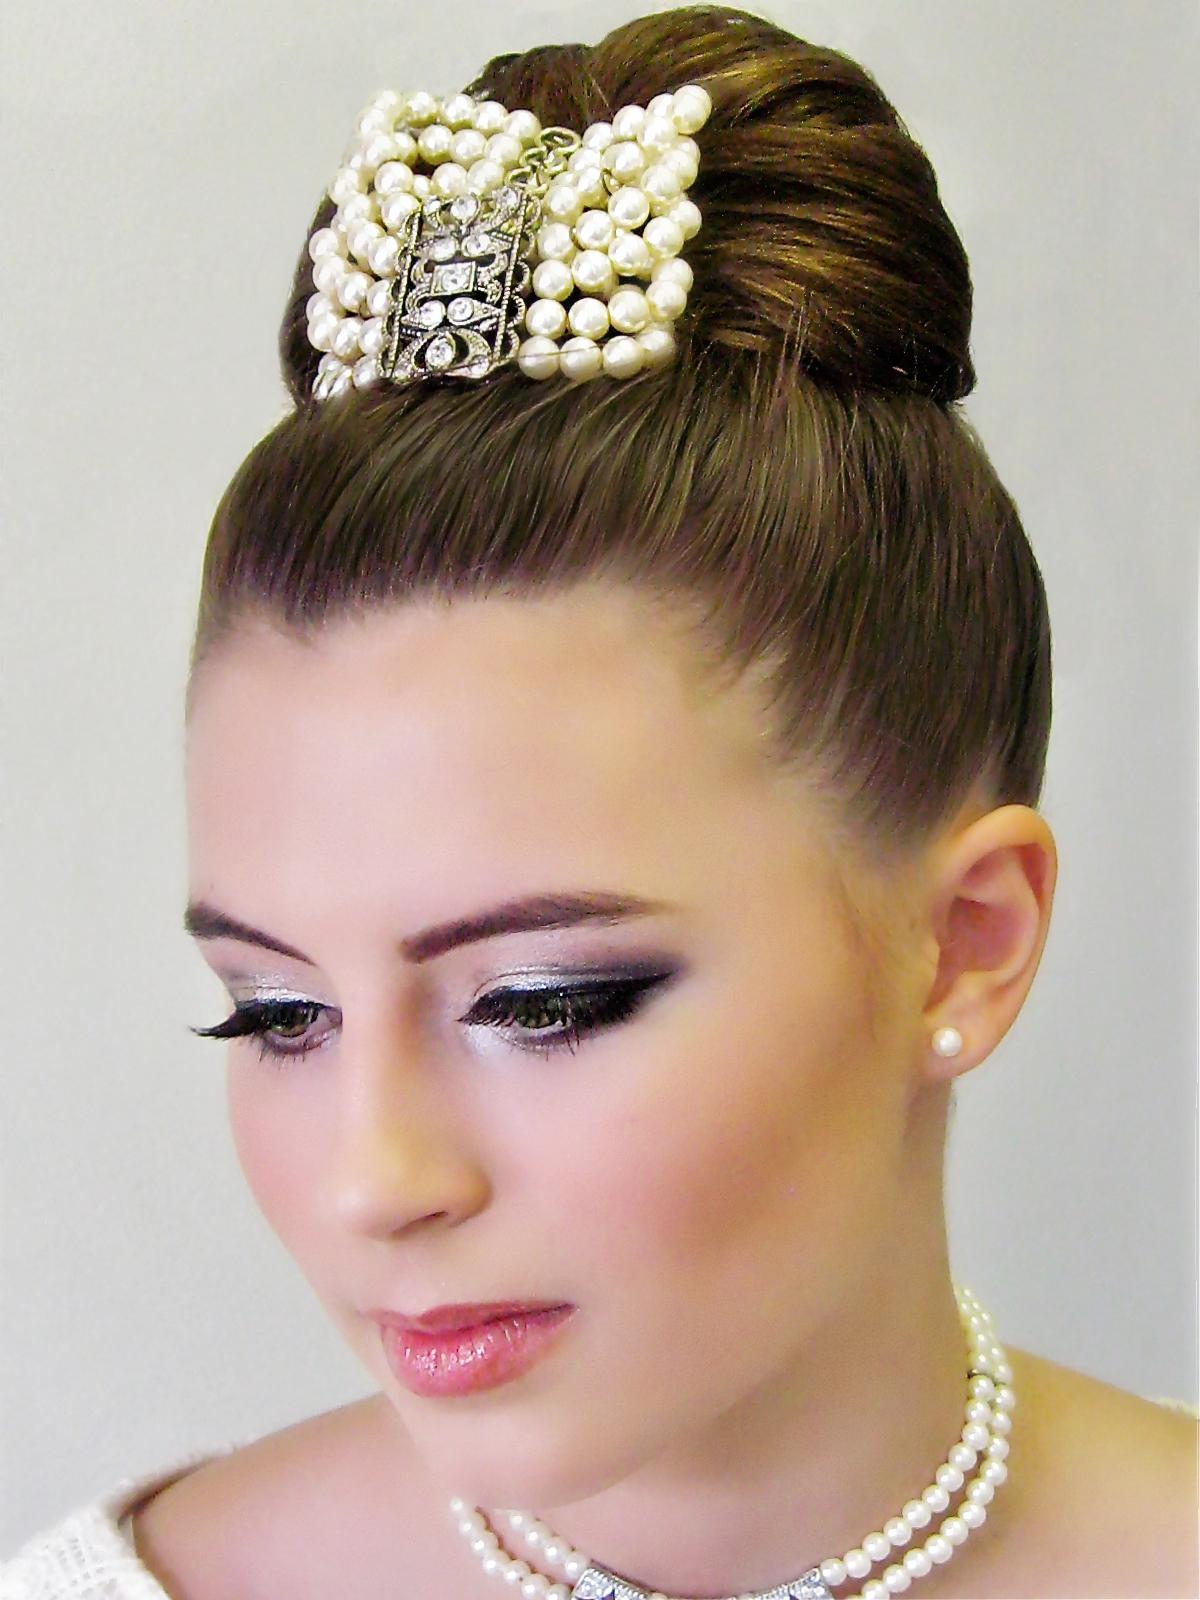 Asian Bridal Makeup Artist London | Makeup Artist Wedding London